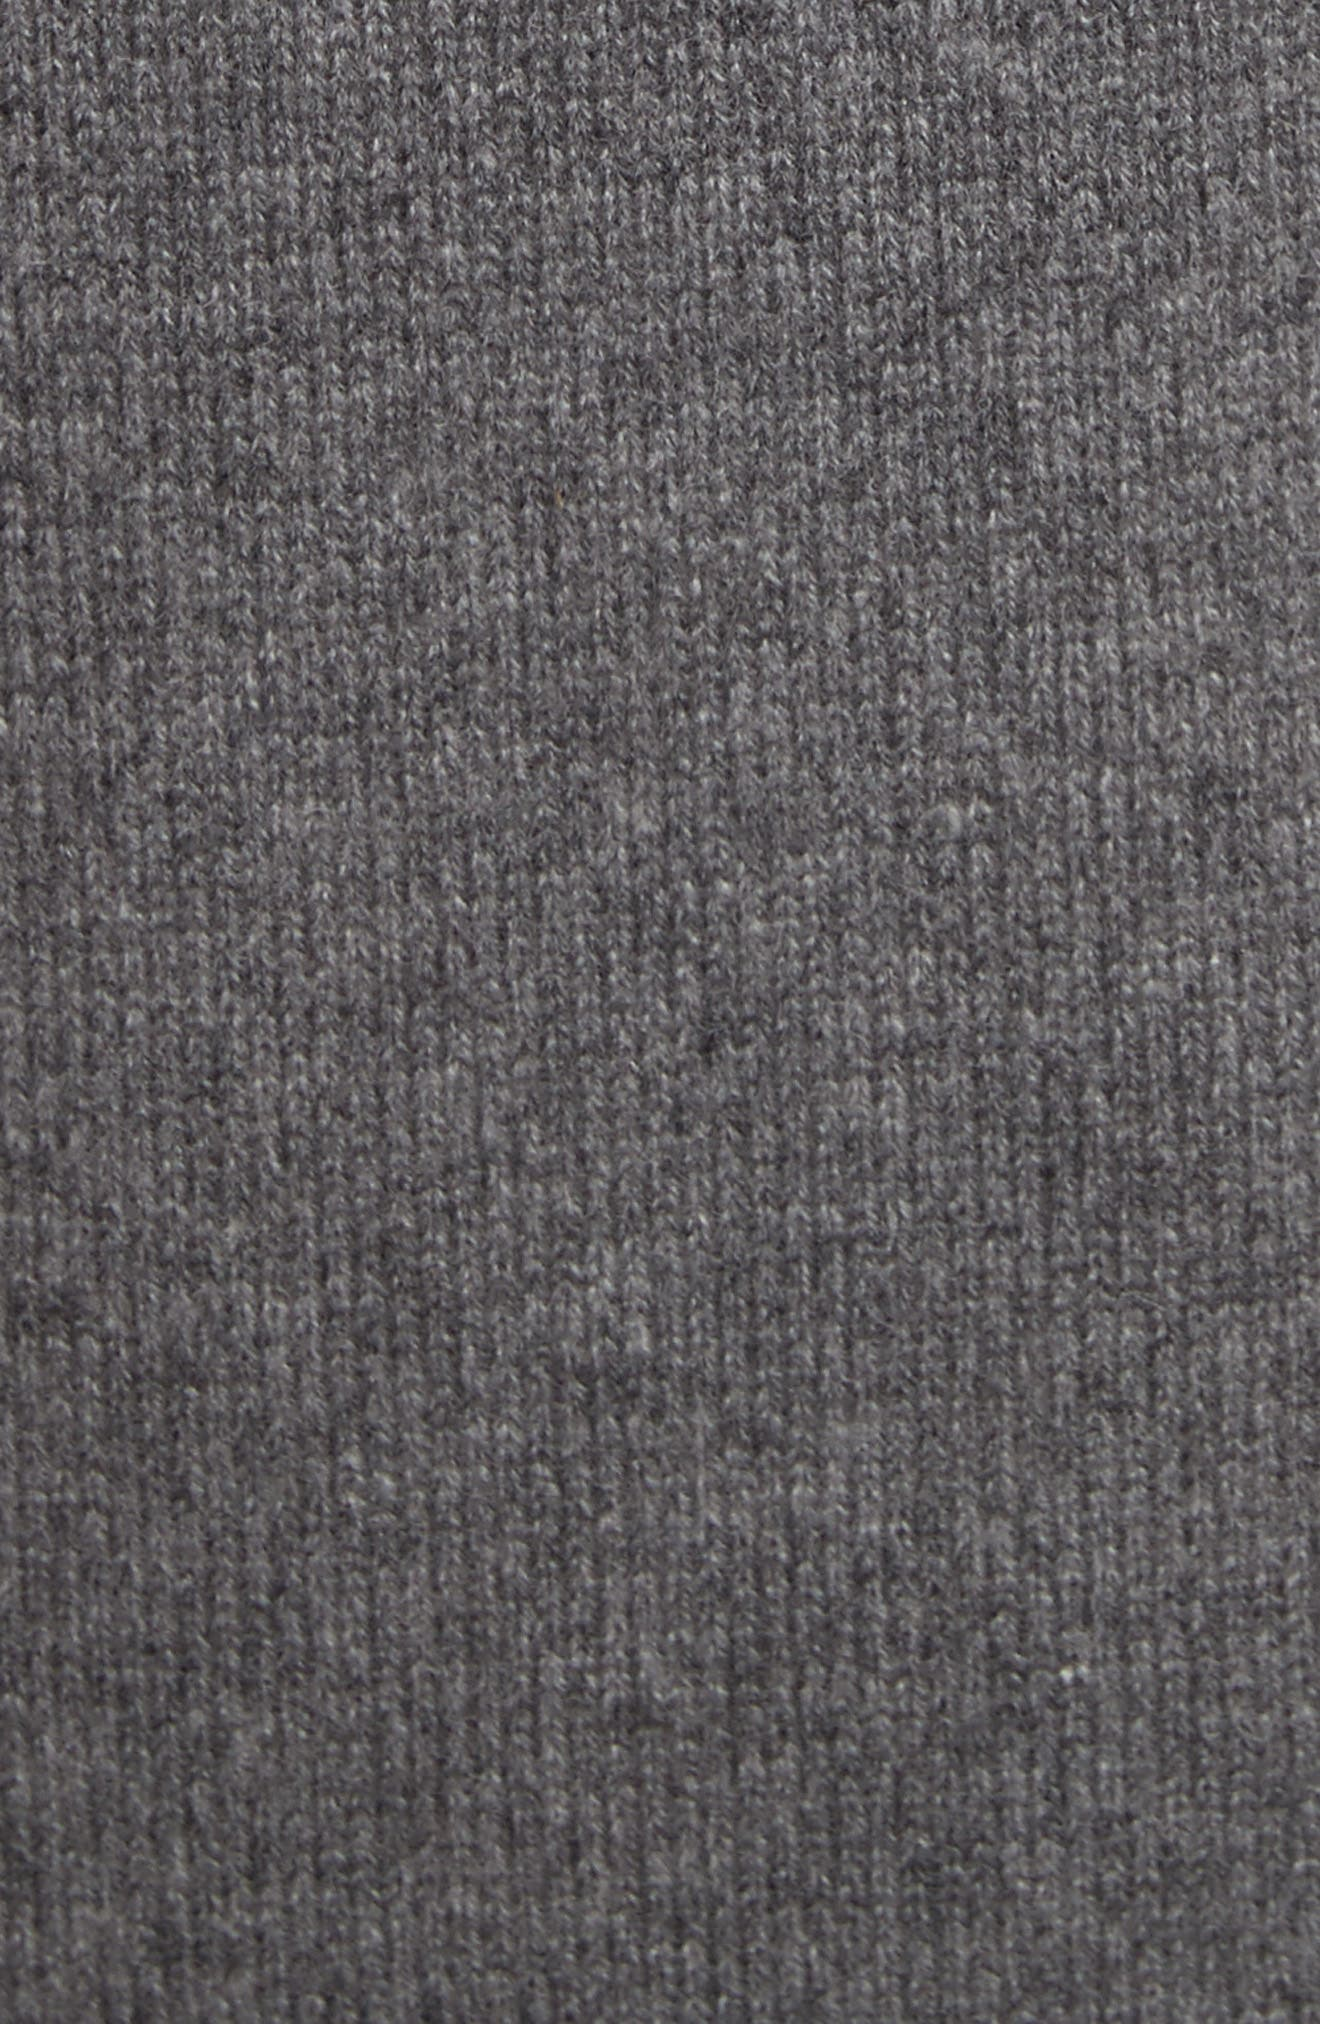 Cashmere Mini Cape Turtleneck Sweater,                             Alternate thumbnail 5, color,                             020